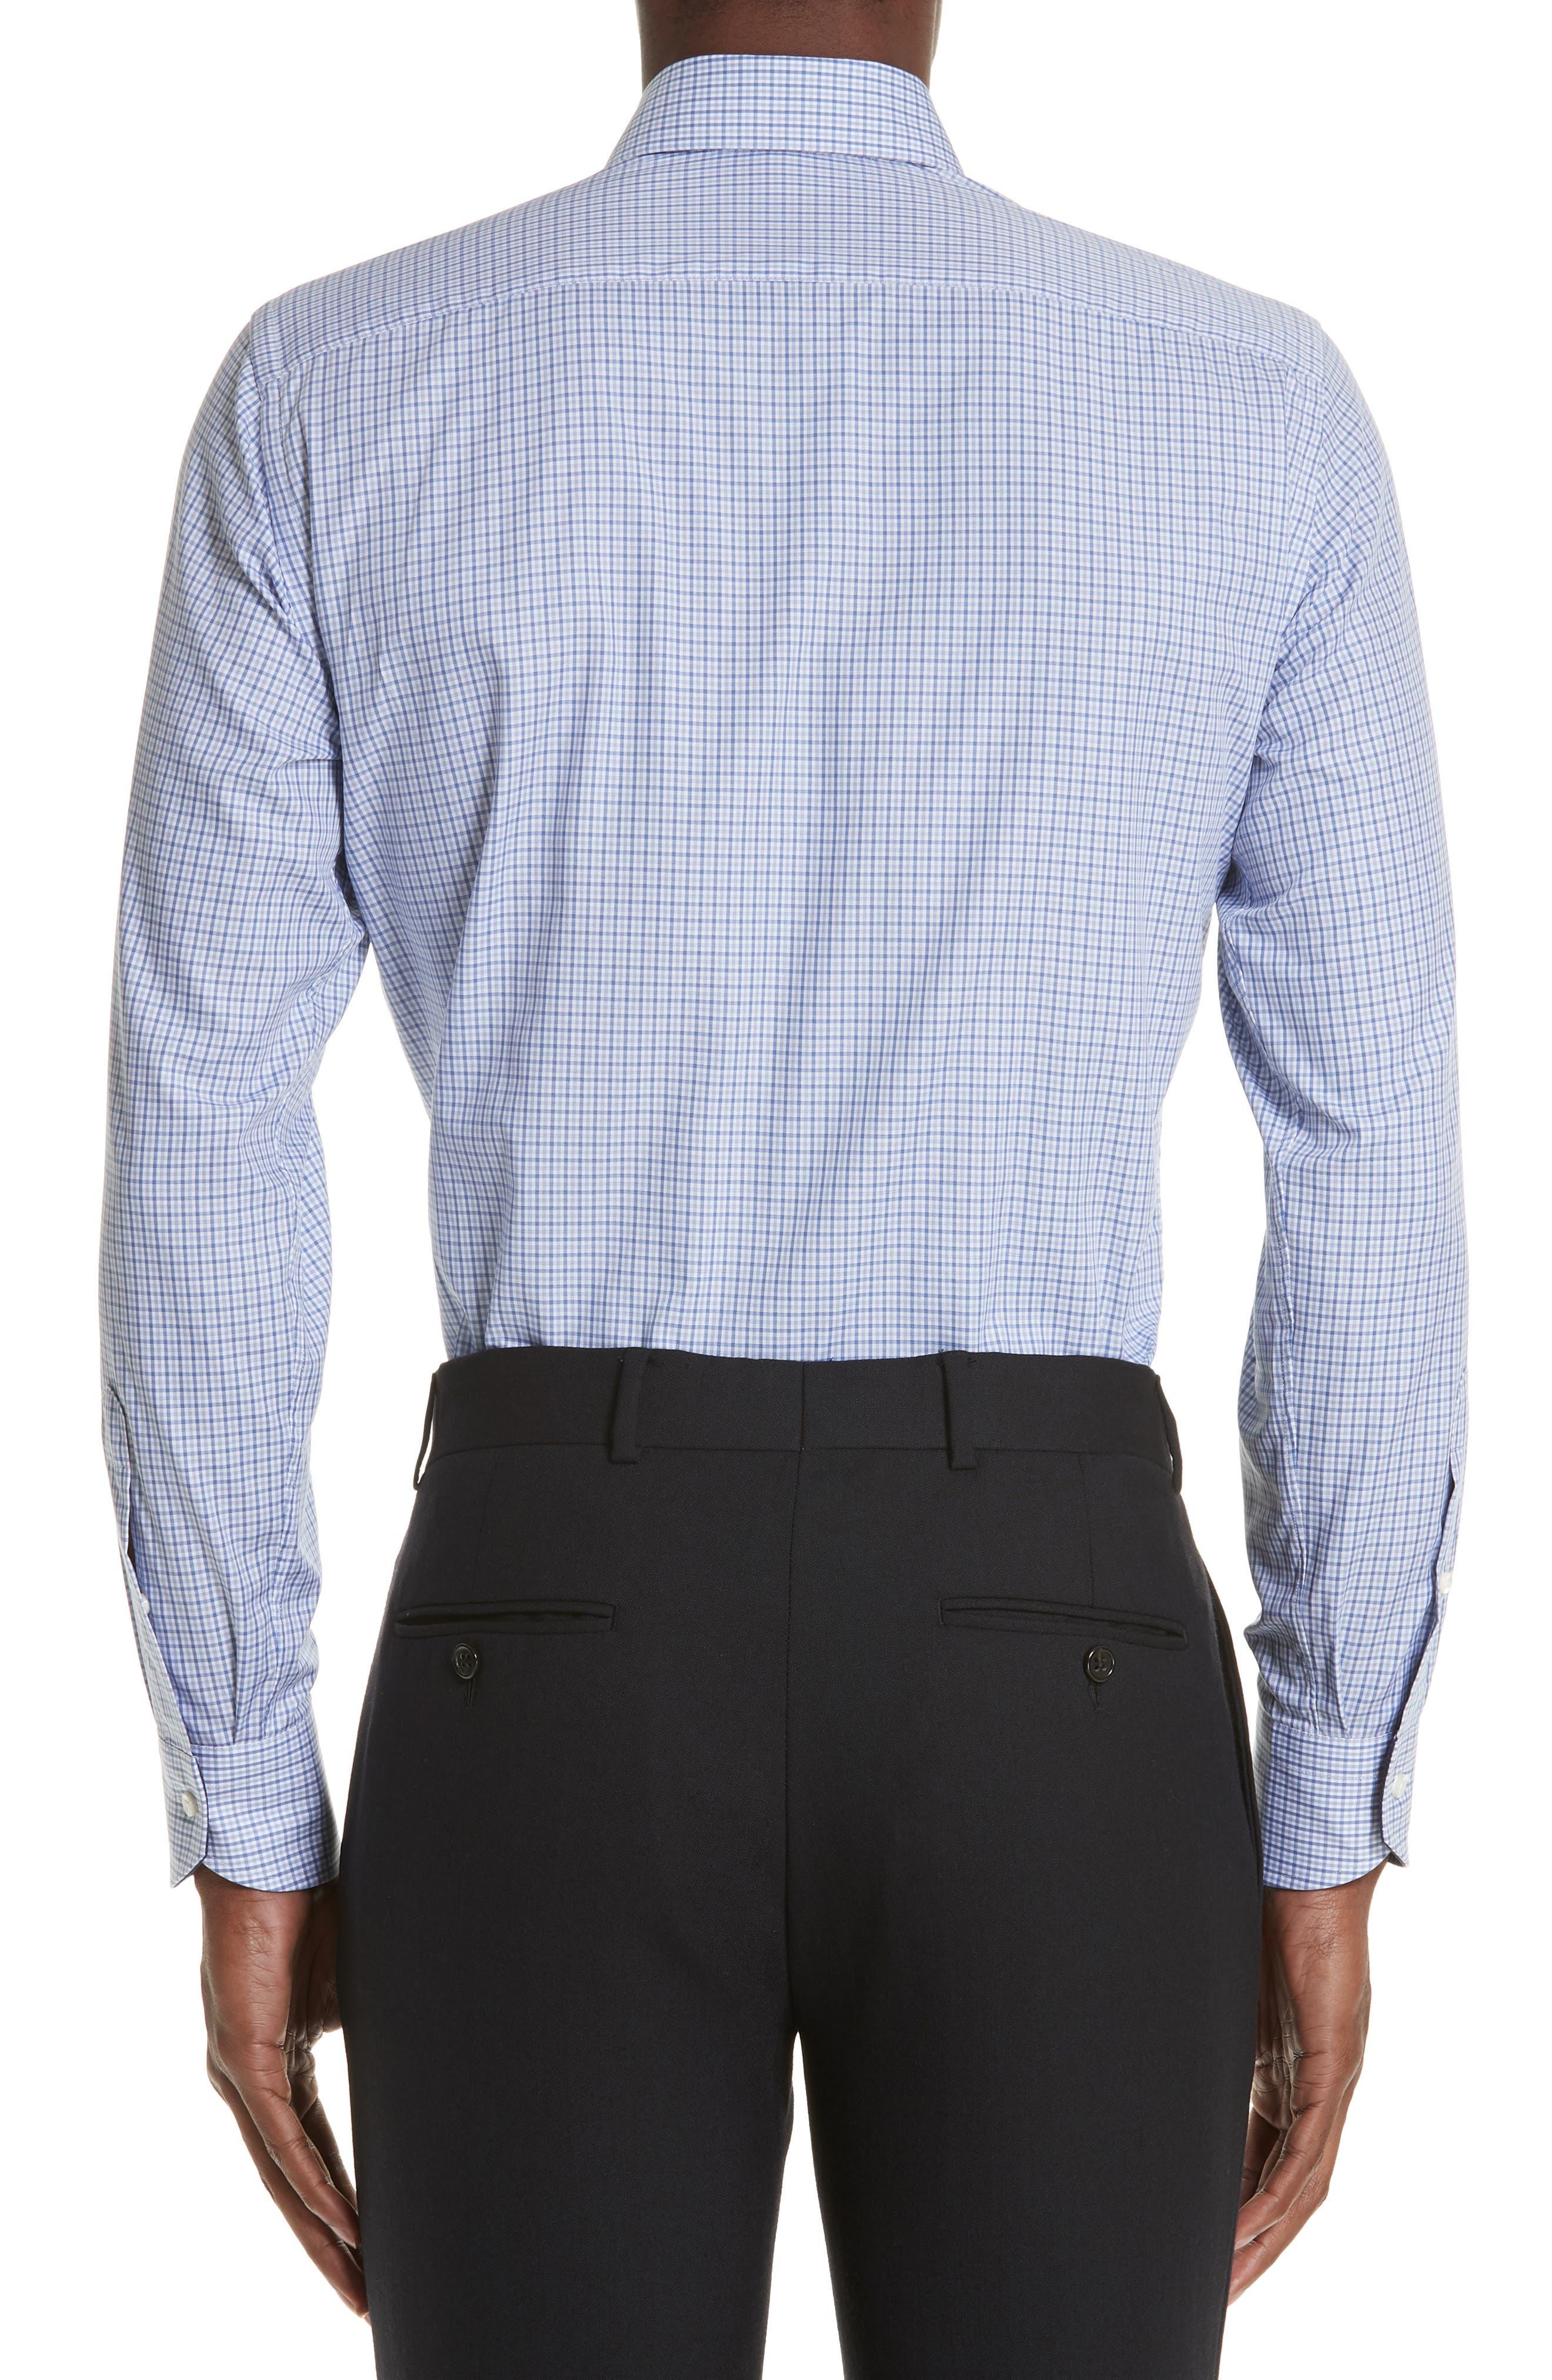 Regular Fit Check Dress Shirt,                             Alternate thumbnail 3, color,                             Medium Blue